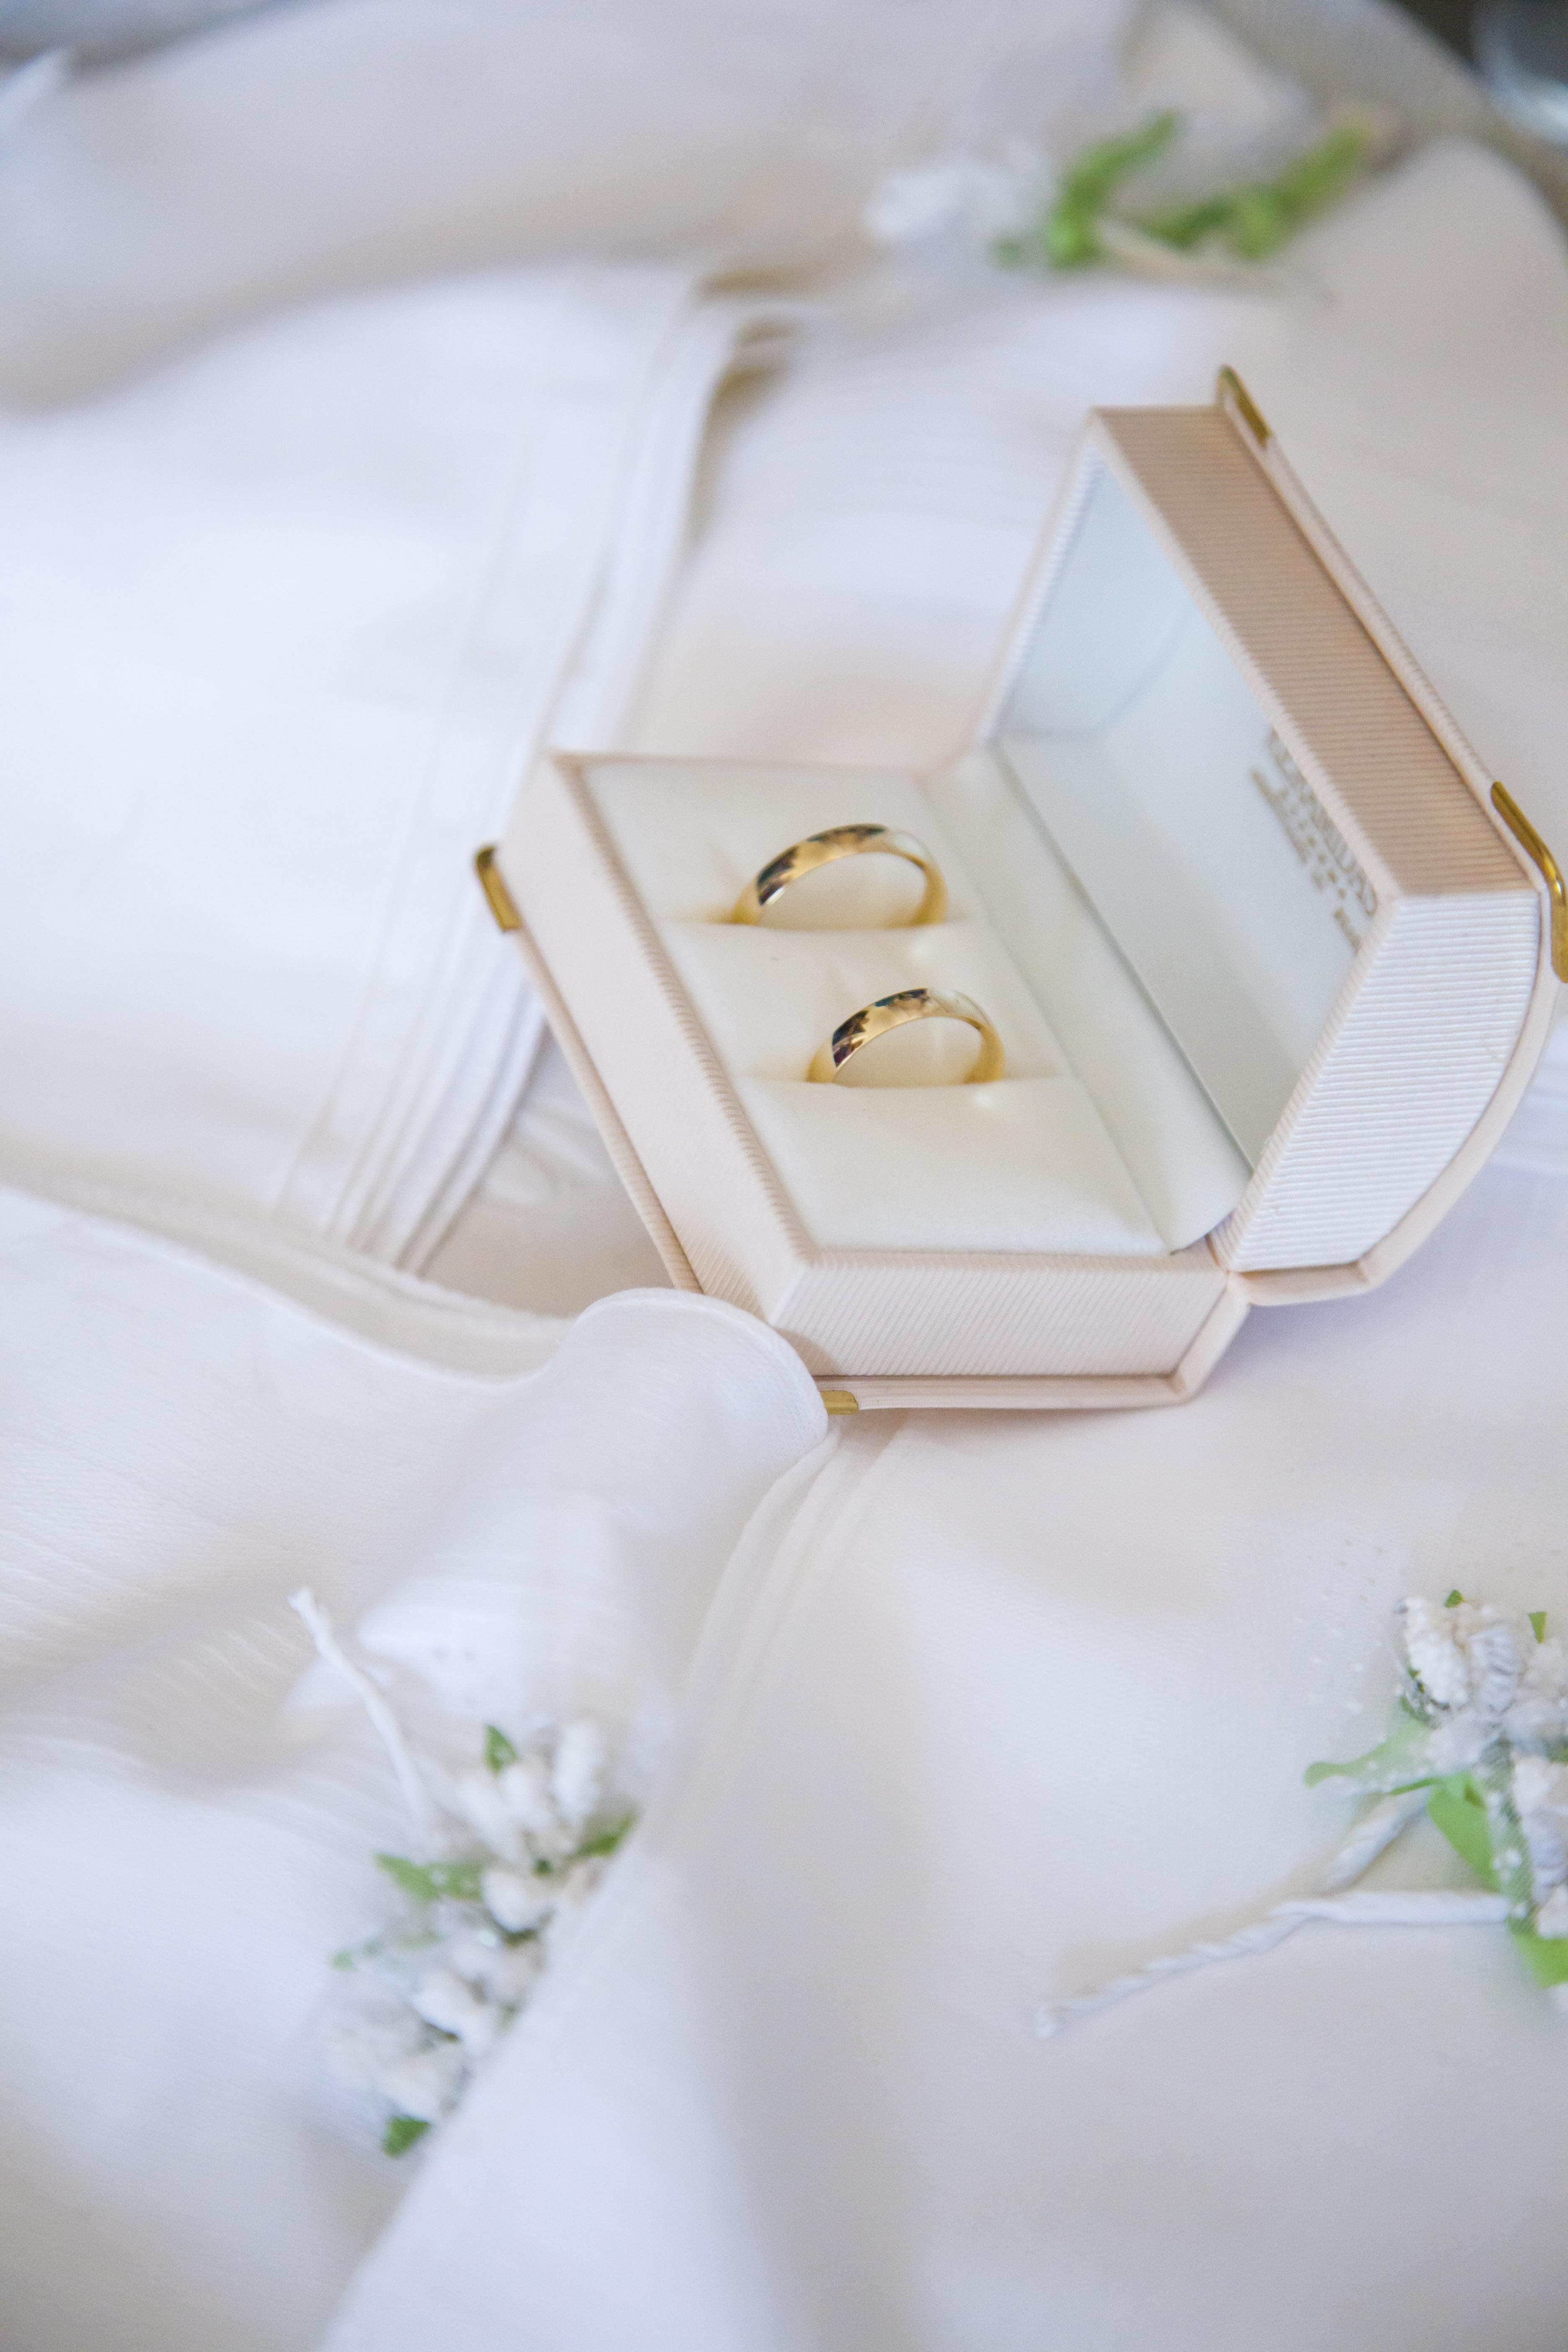 Free Images White Ring Flower Petal Decoration Box Wedding